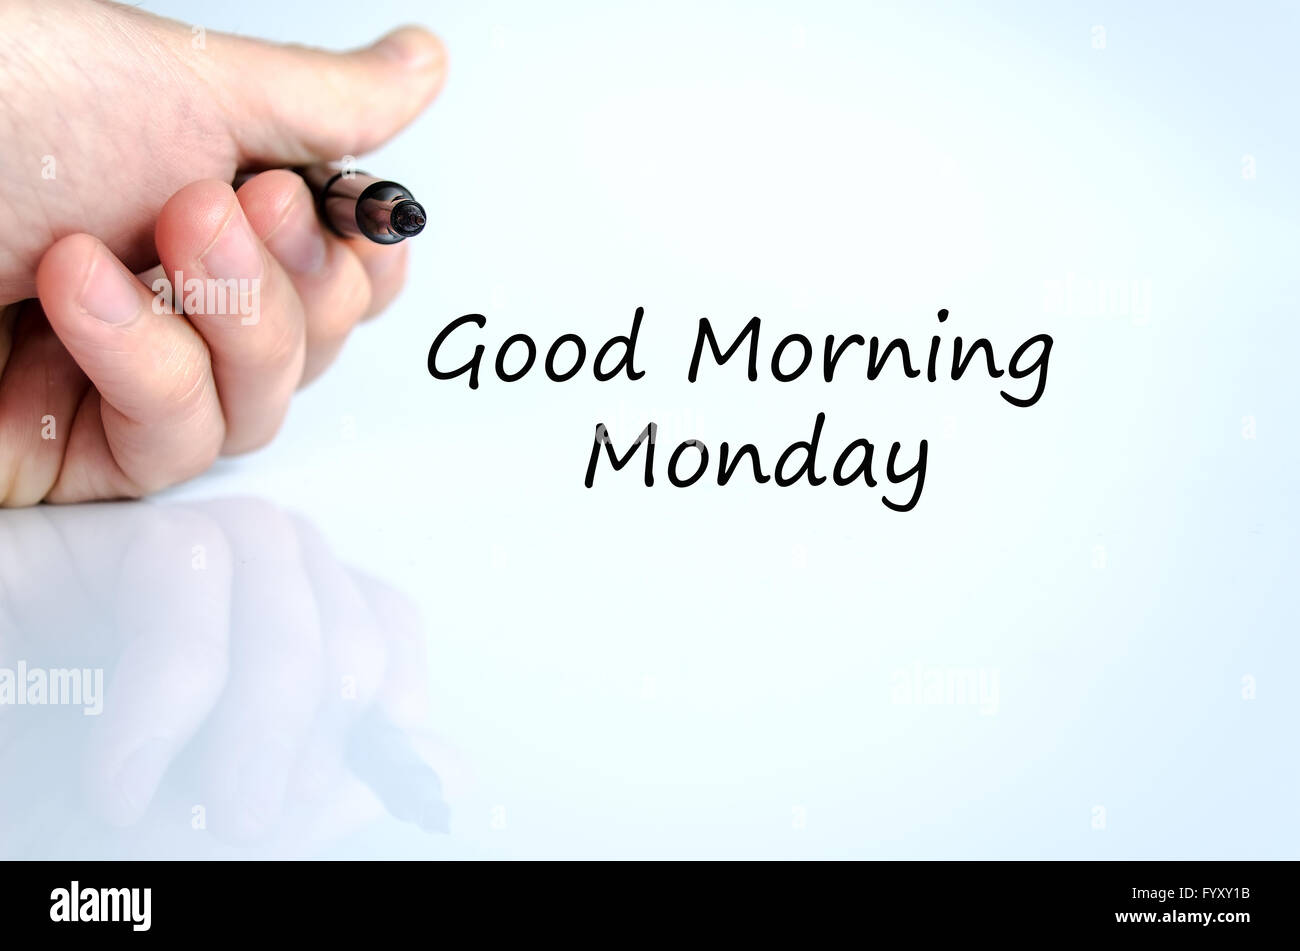 Guten Morgen Montag Textkonzept Stockfoto Bild 103239511 Alamy